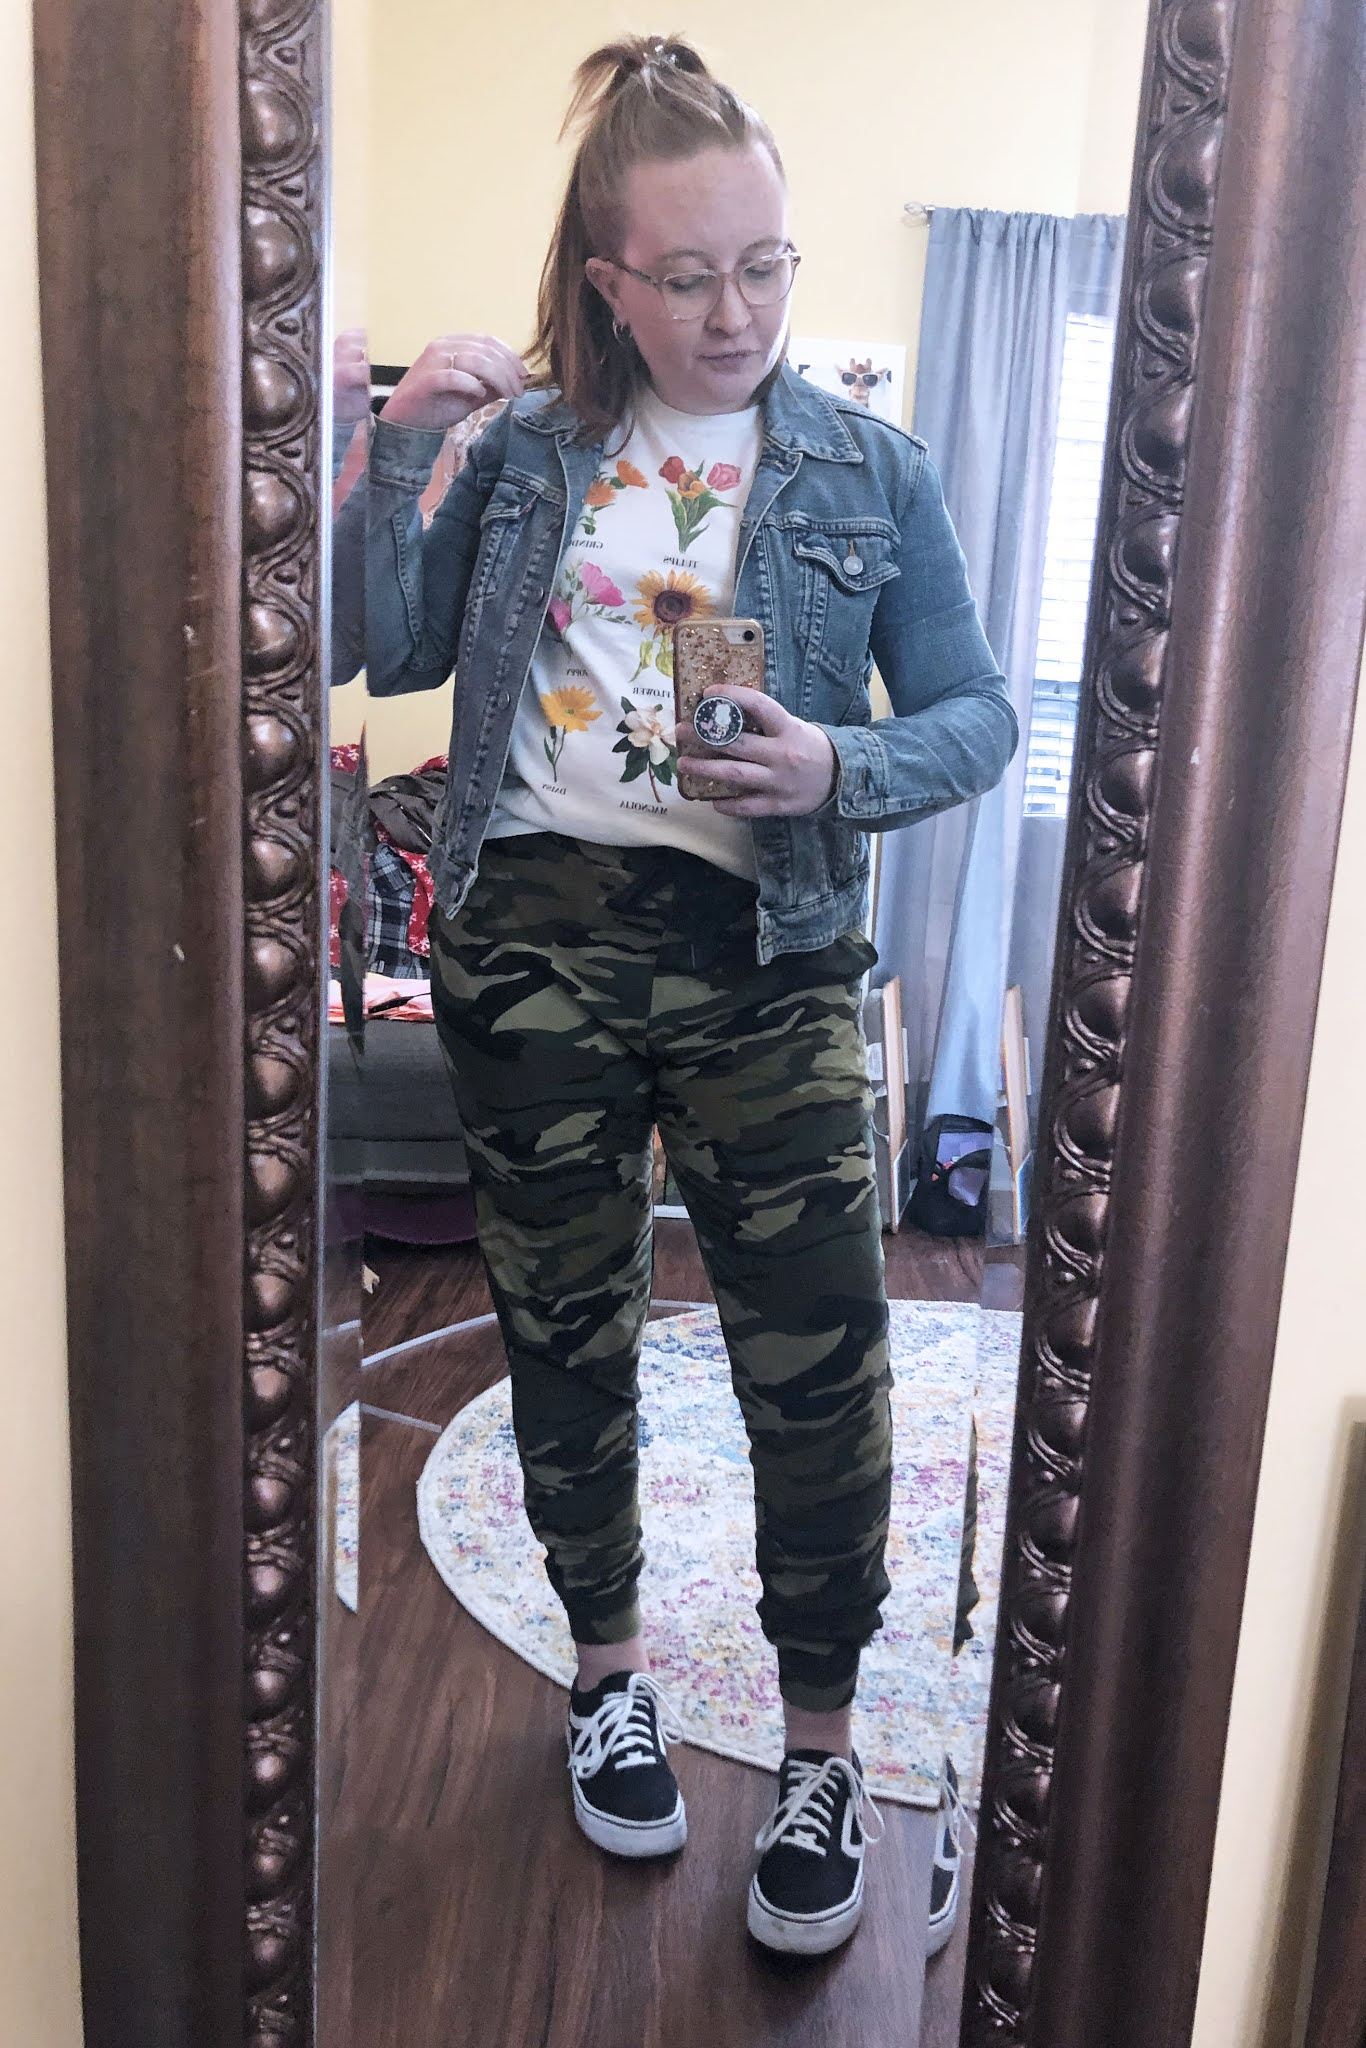 camo-joggers-flower-tee-denim-jacket-vintage-sneakers